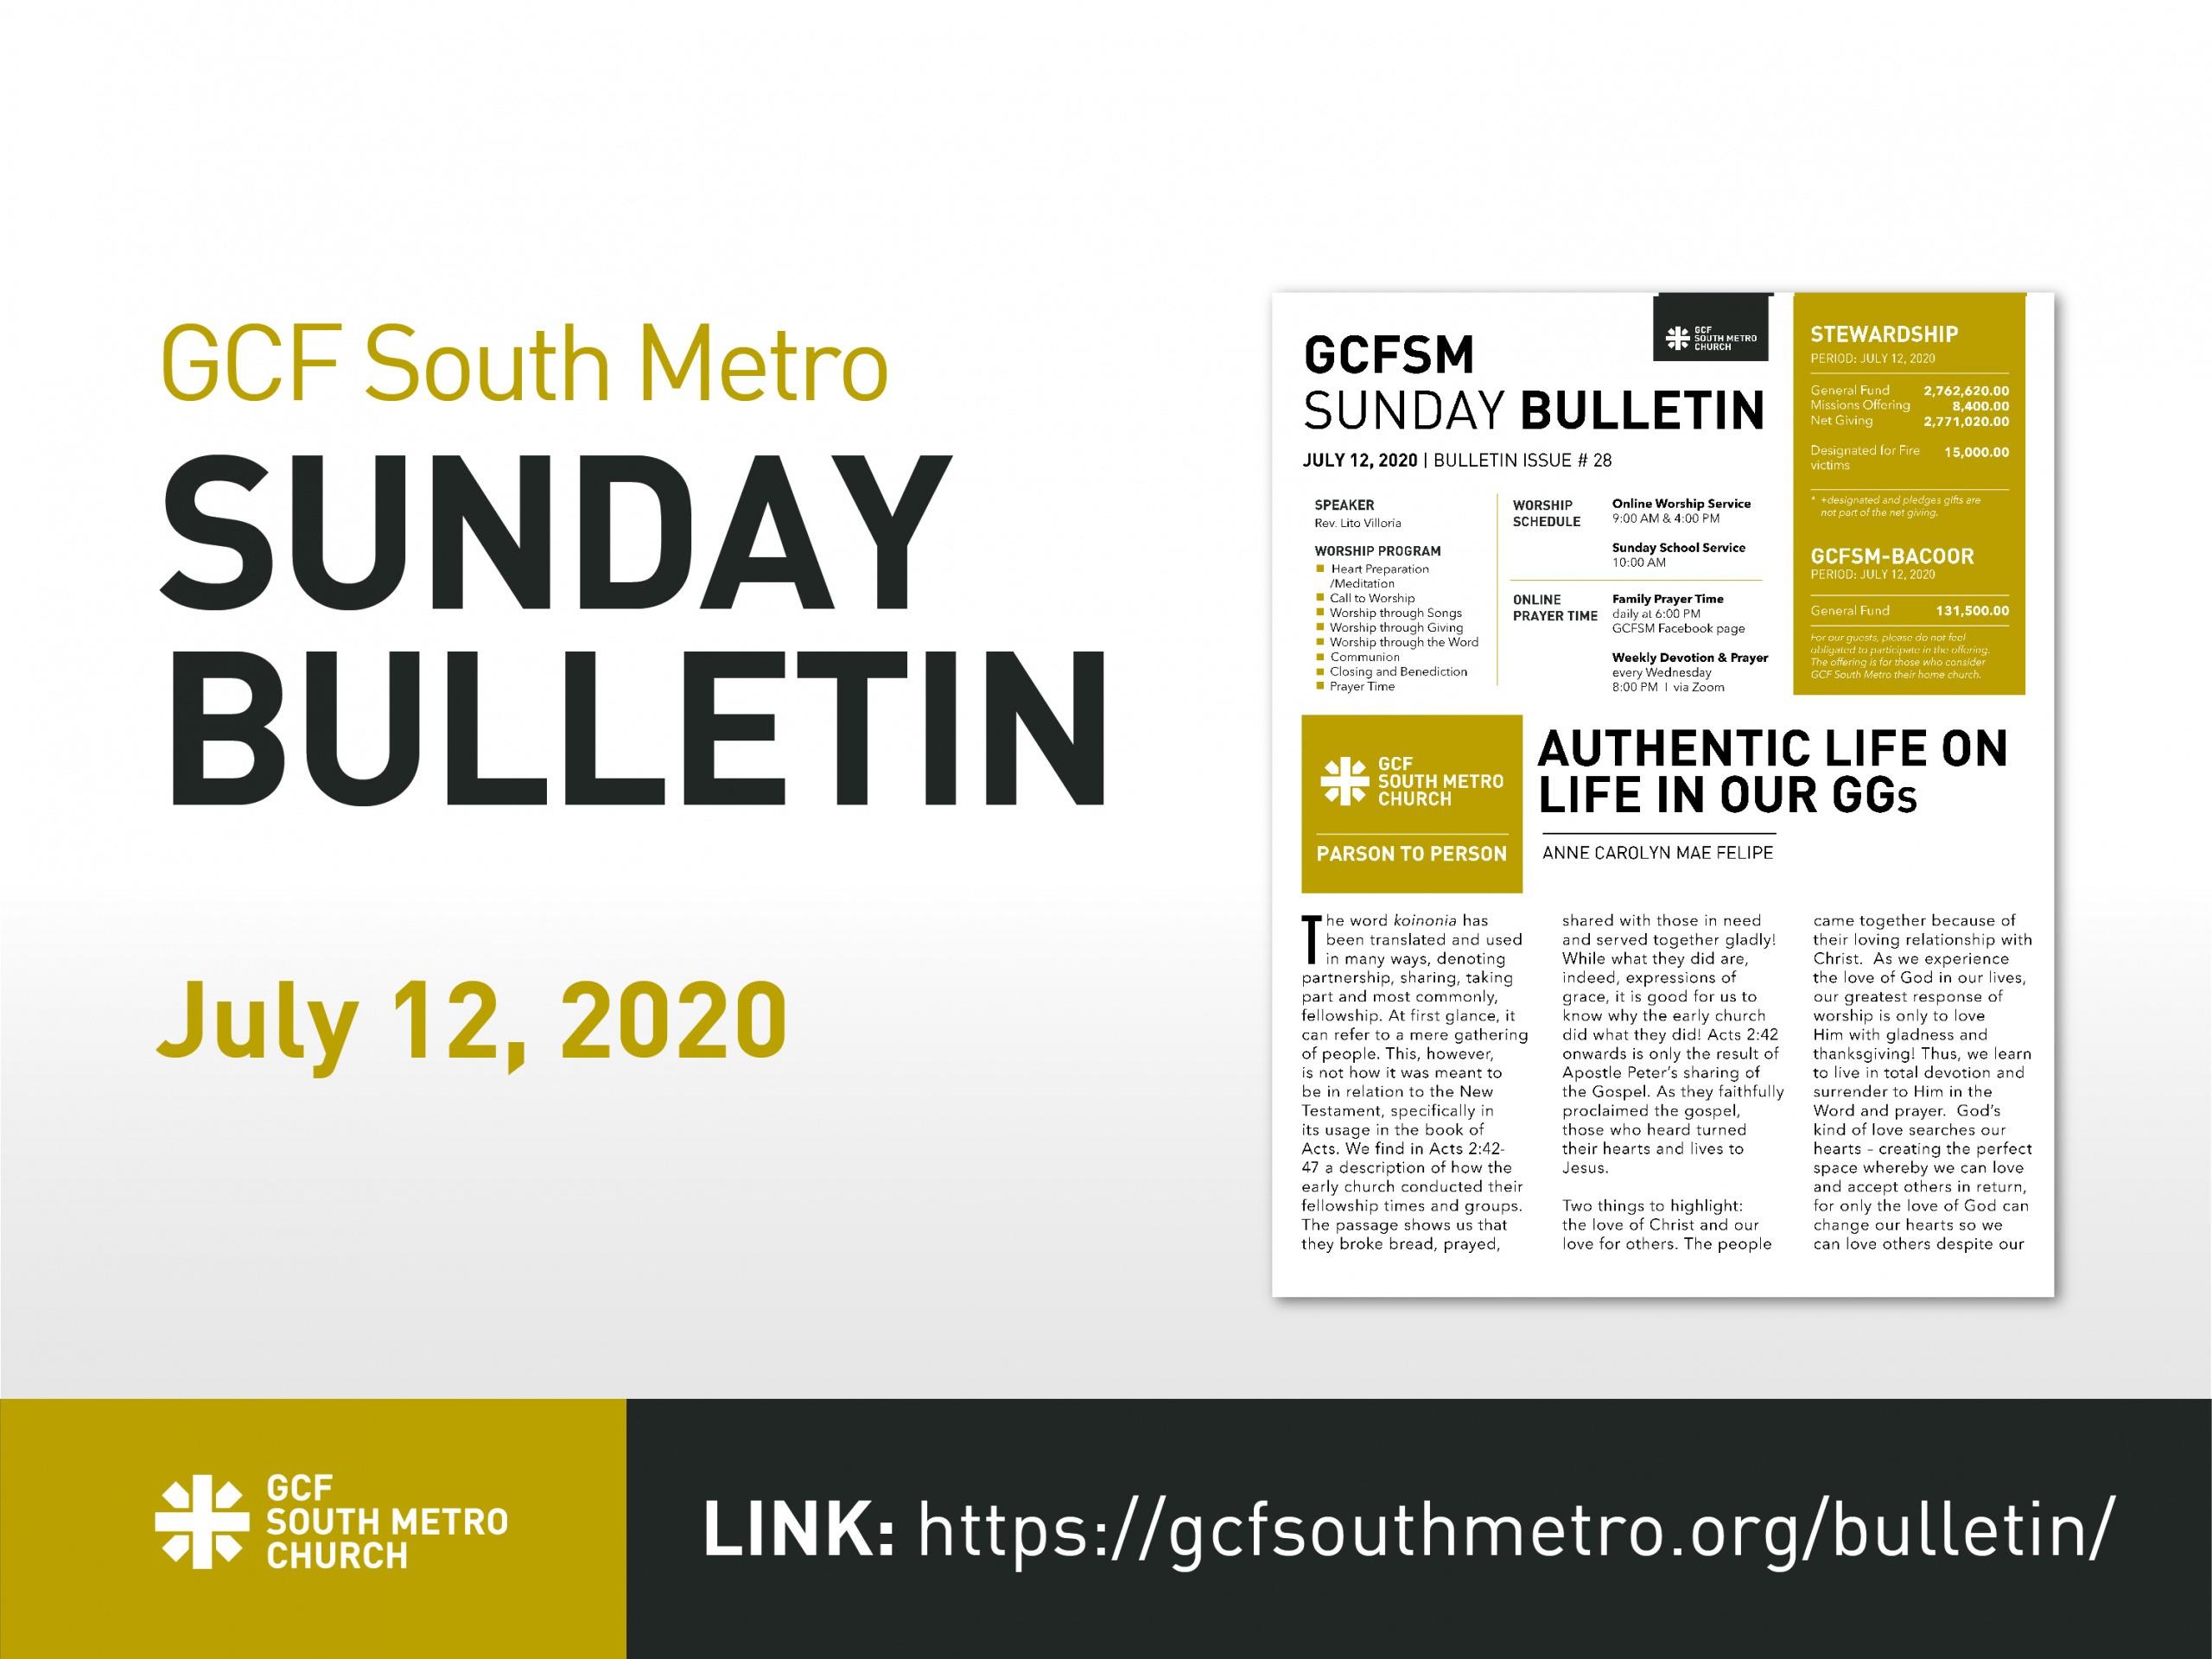 Sunday Bulletin, July 12, 2020